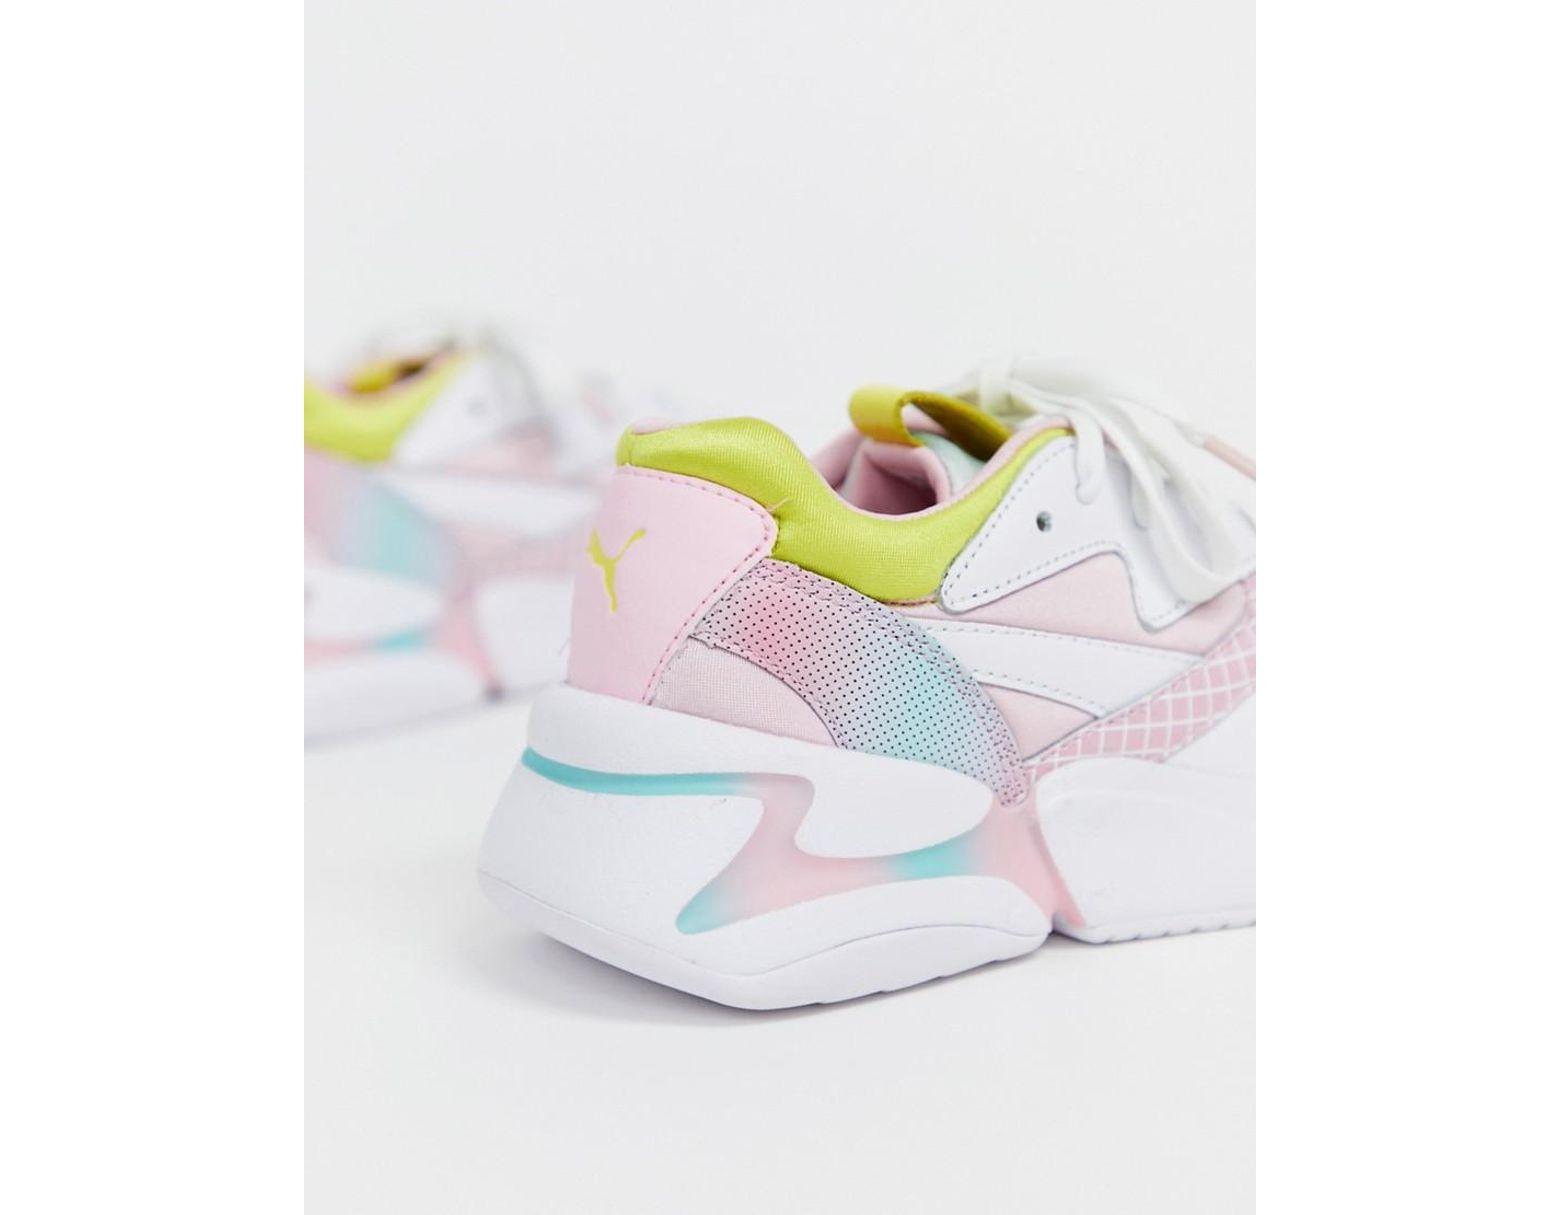 555d6b355 PUMA X Barbie Nova 90's Block Multi Color Sneakers - Lyst